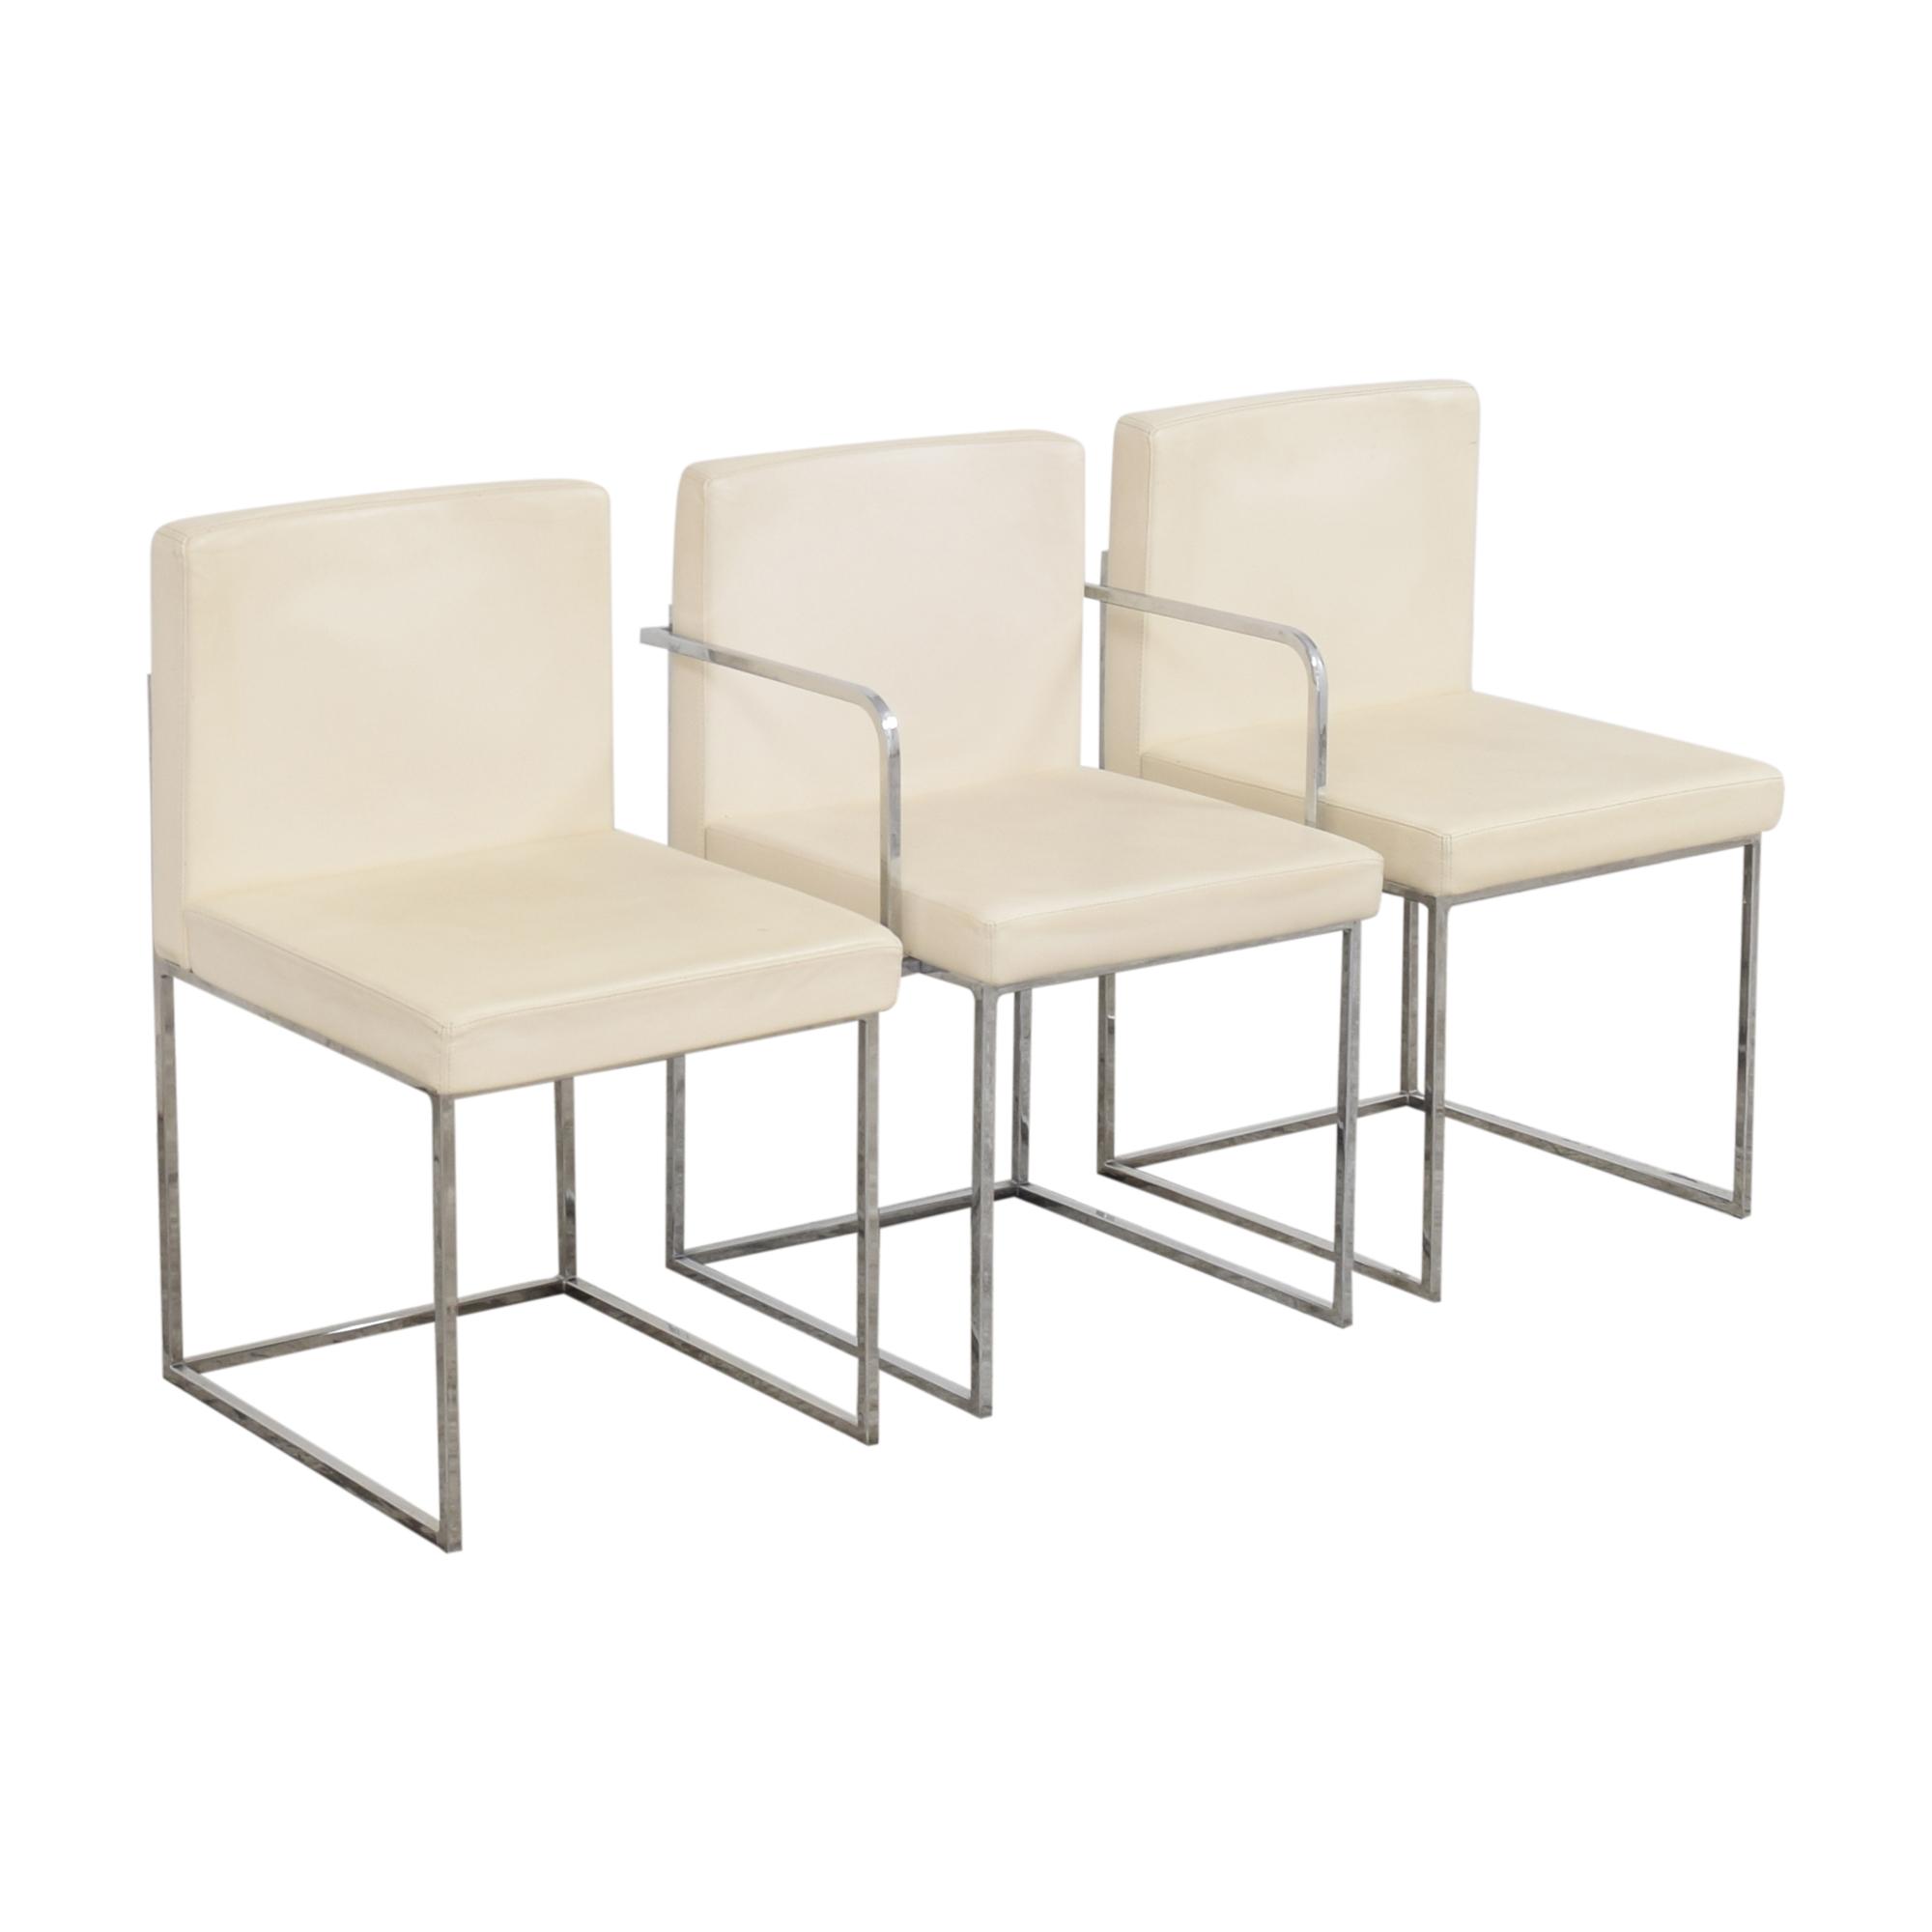 Calligaris Calligaris Even Plus Chairs pa